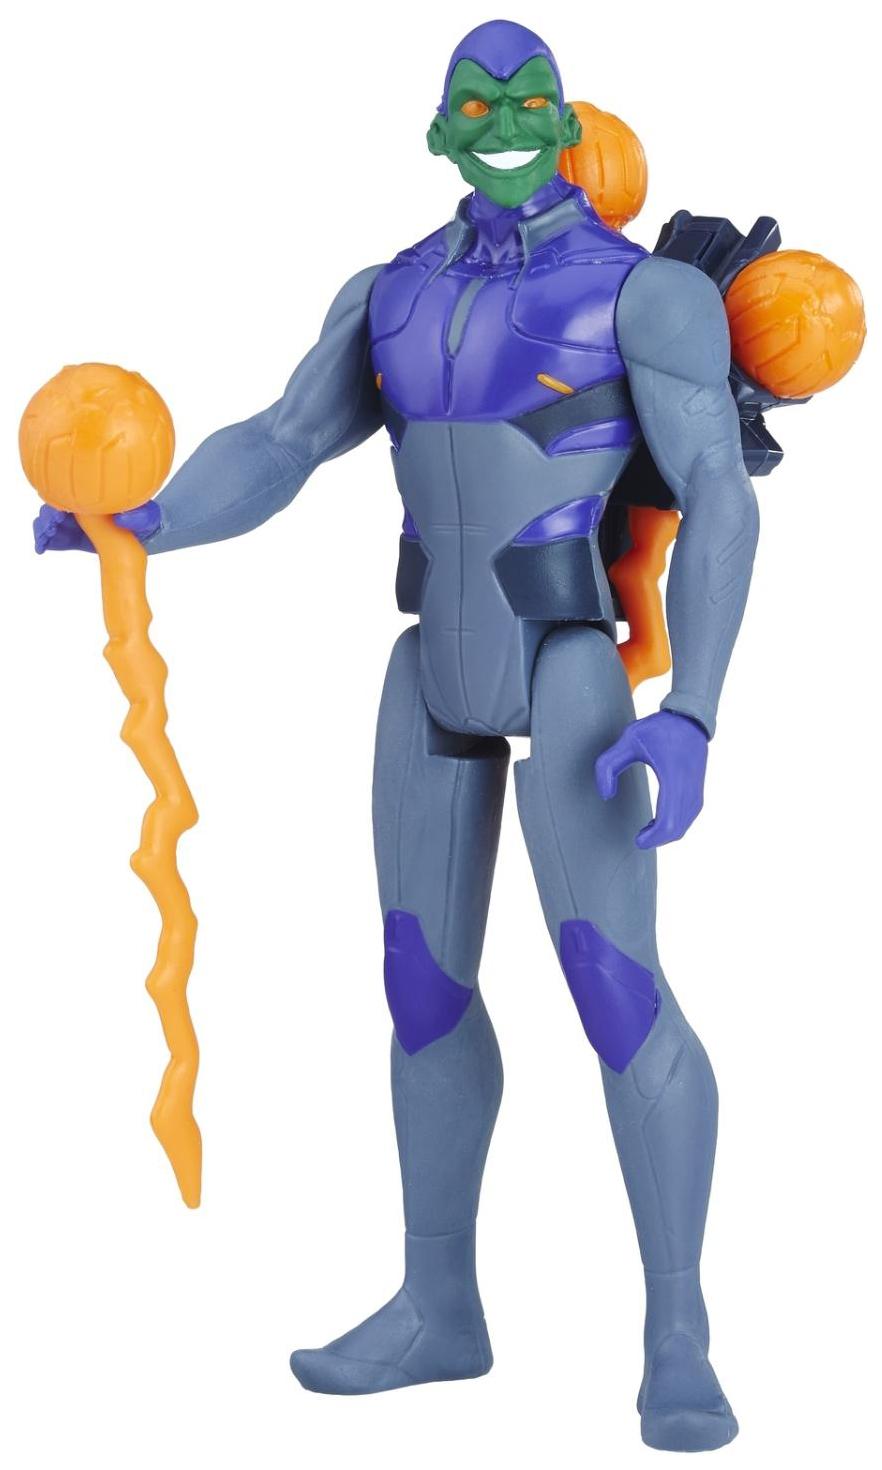 Фигурка Человека-Паука Hasbro Spider-Man E0808/E1107 Хобгоблин с аксессуарами